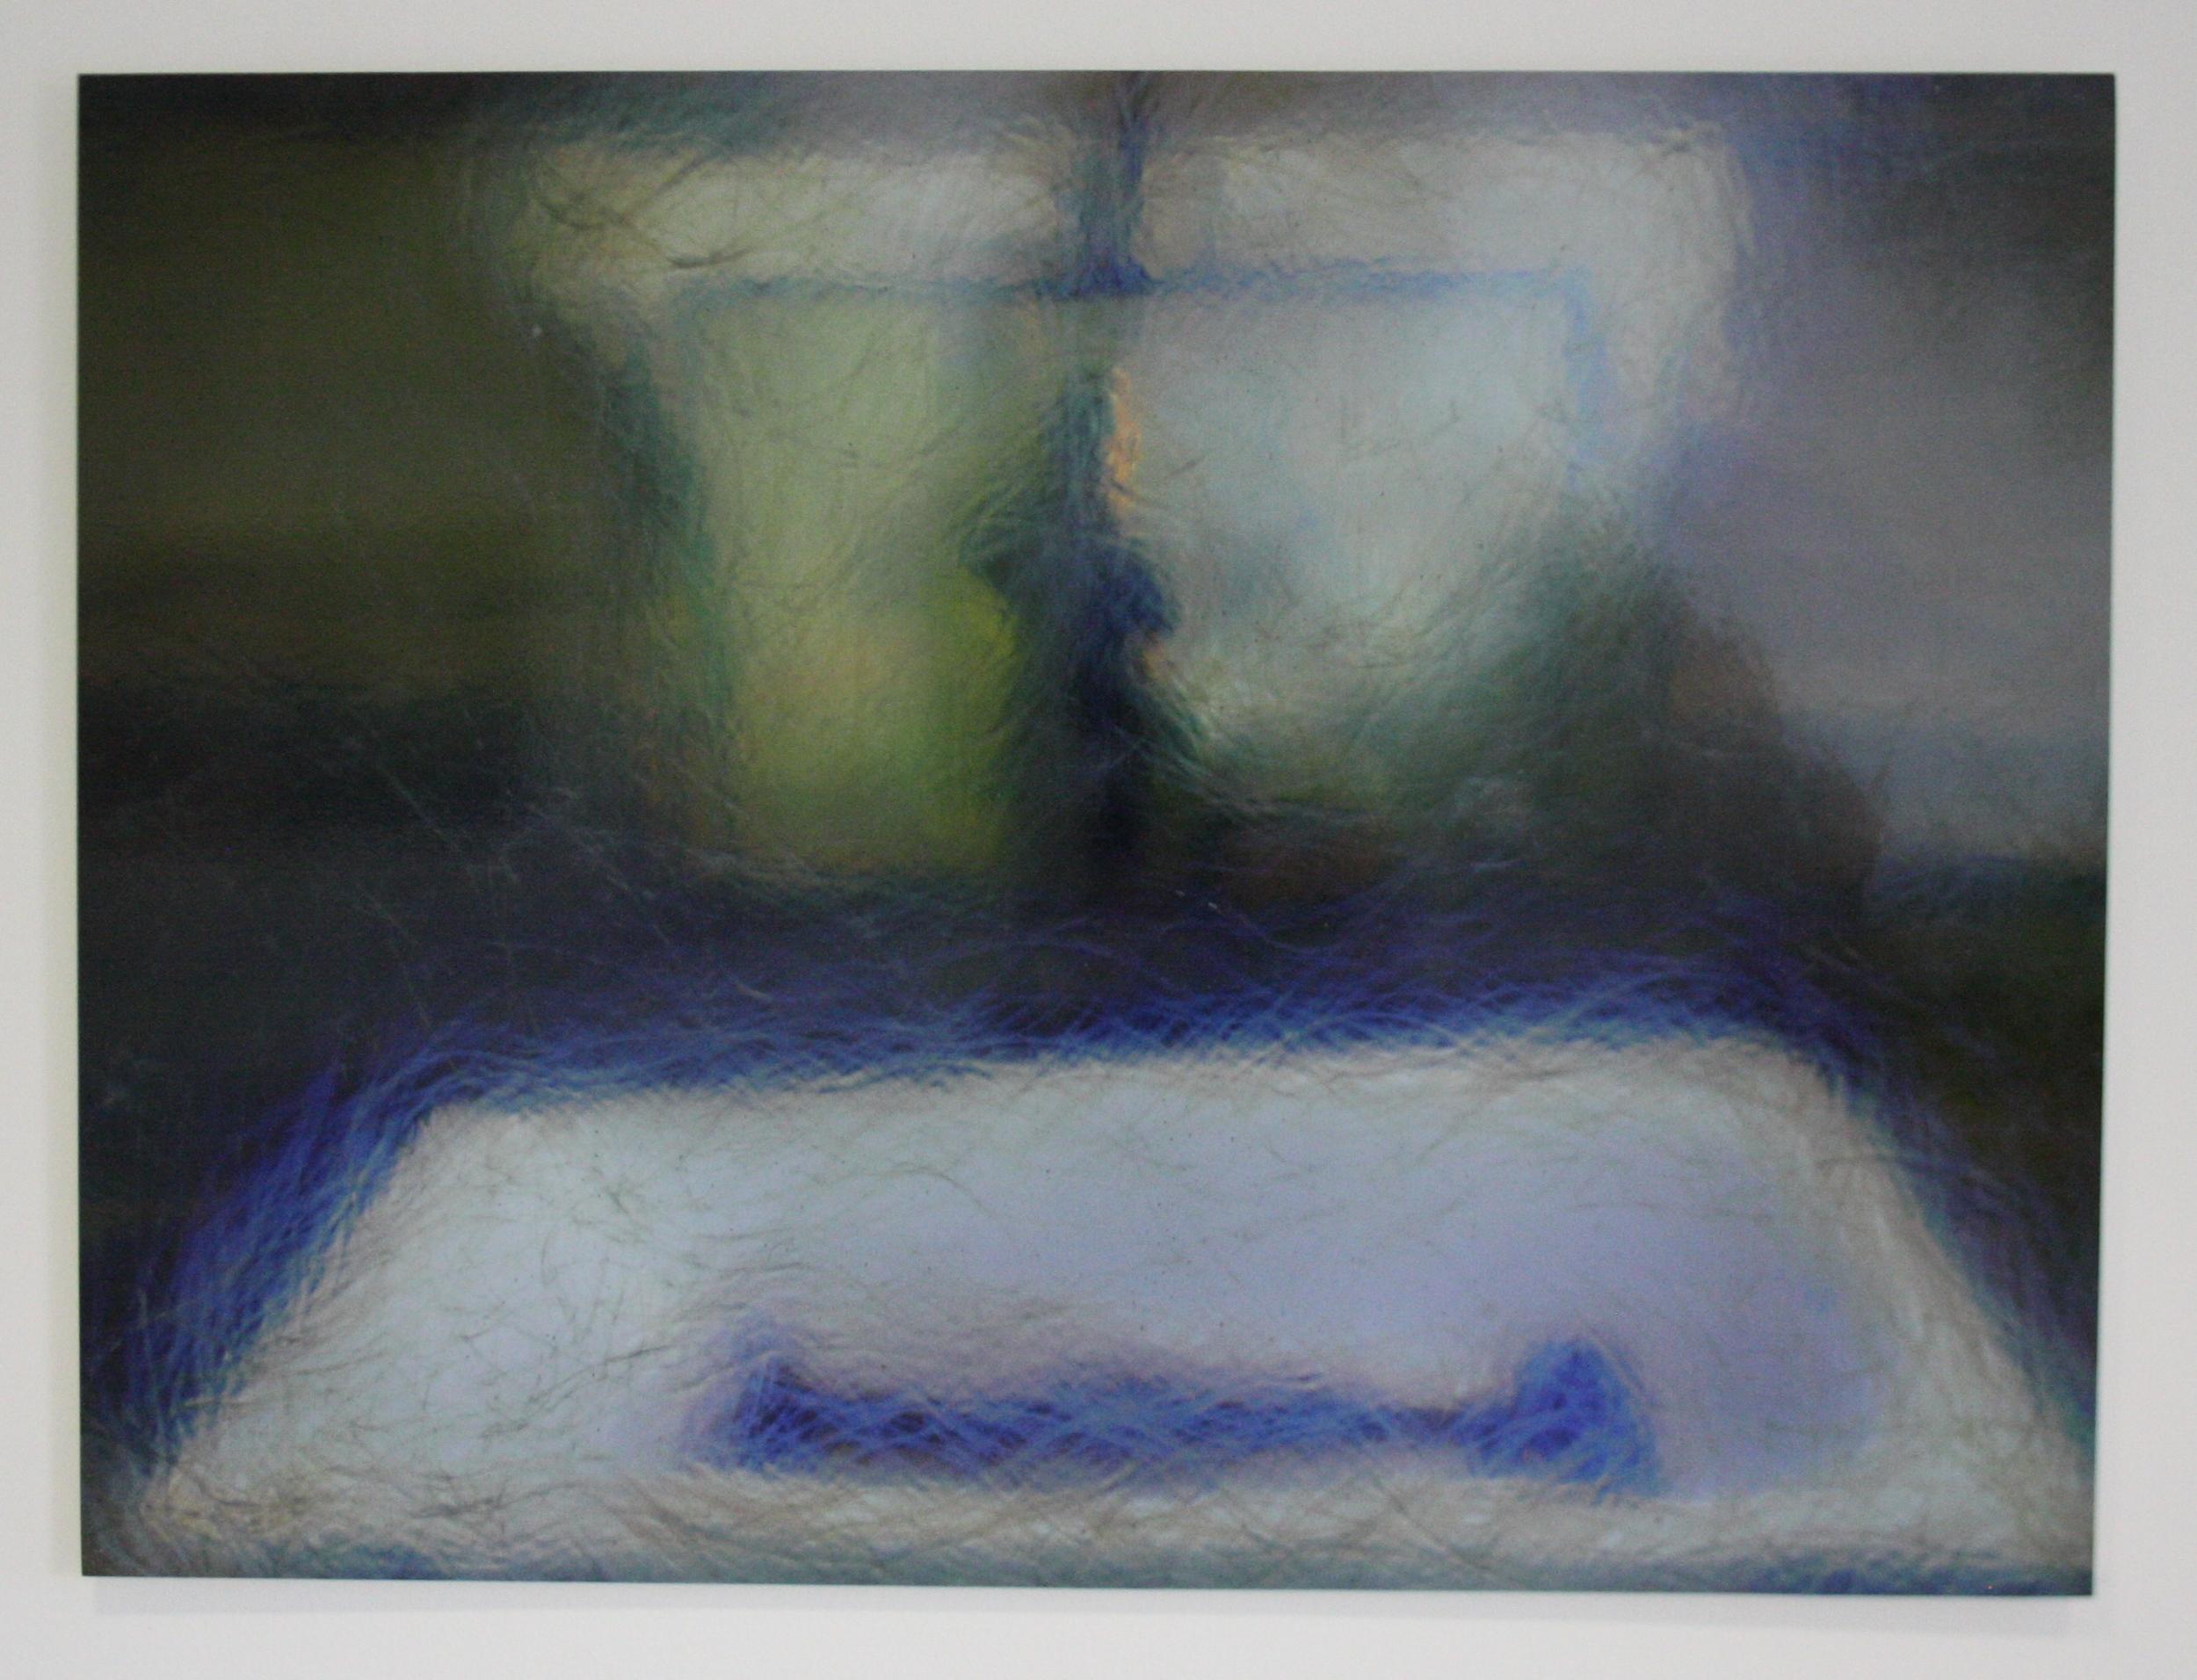 František Skála, Cháron, 2009, 100 x 70 cm, barevná fotografie